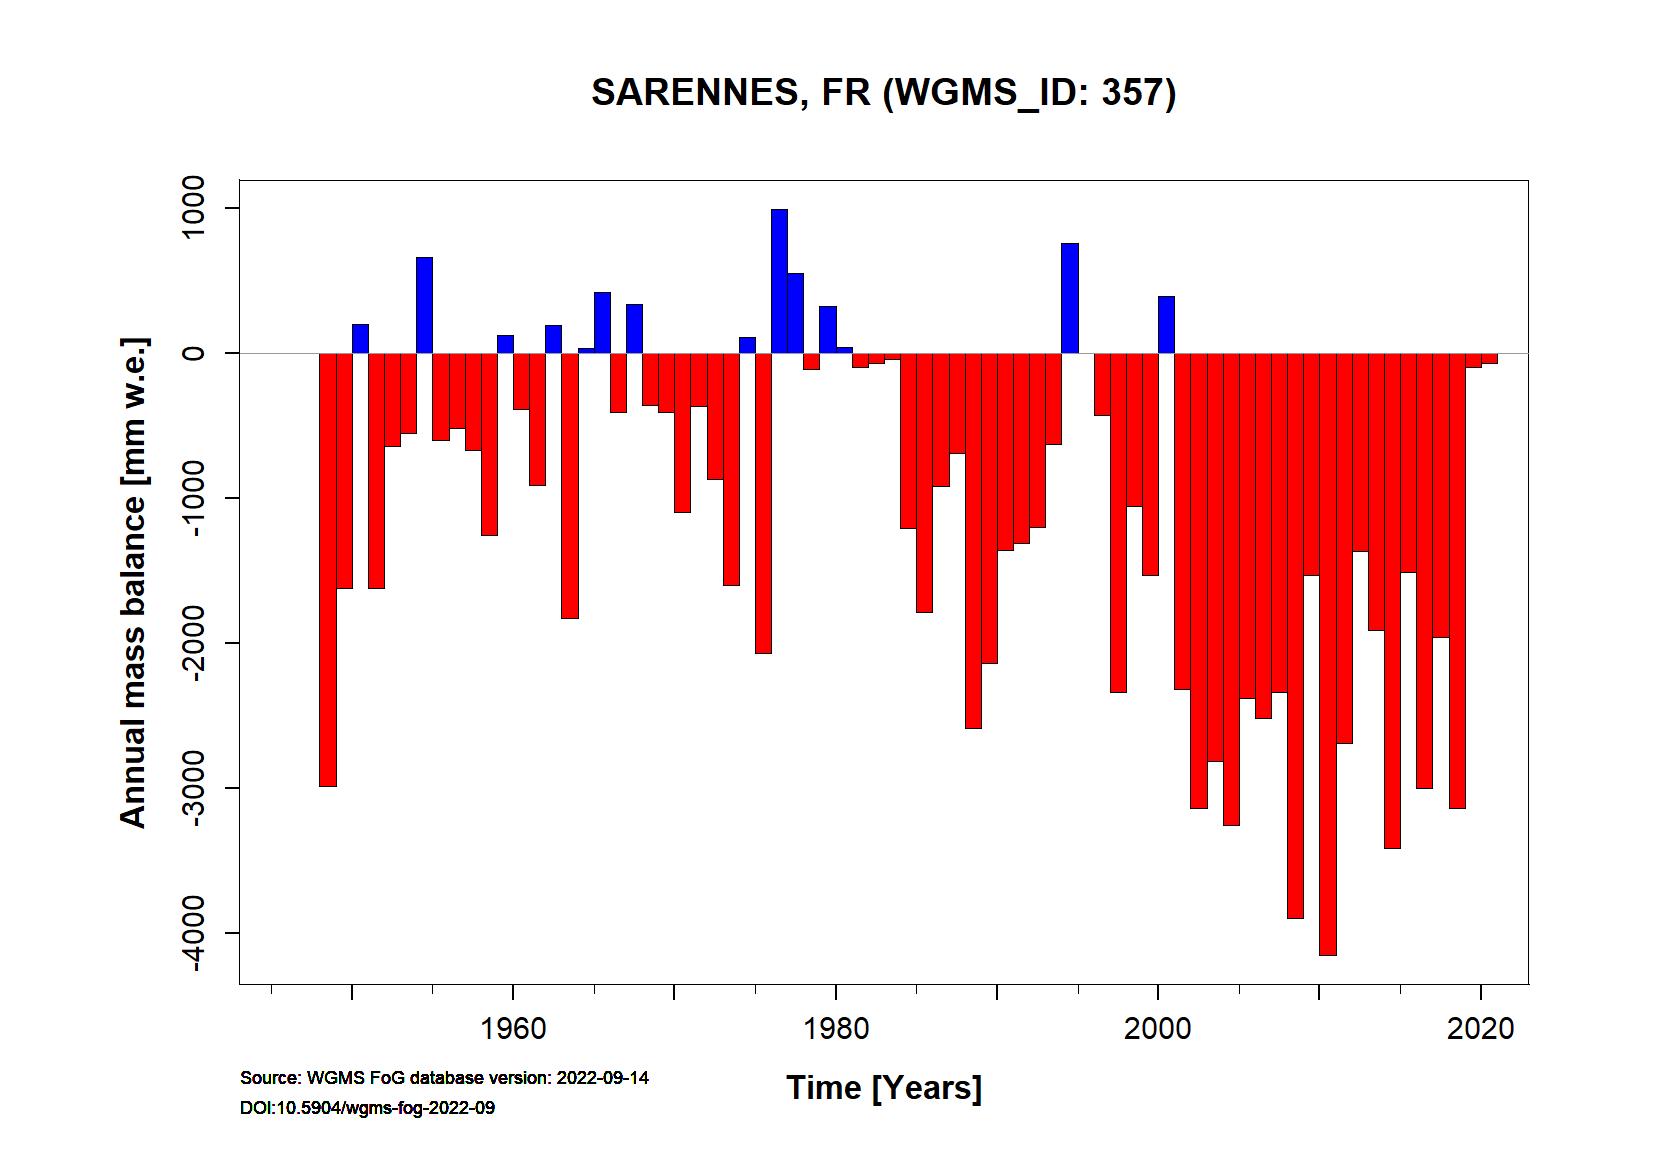 Sarennes glacier Annual Mass Balance (WGMS, 2015)